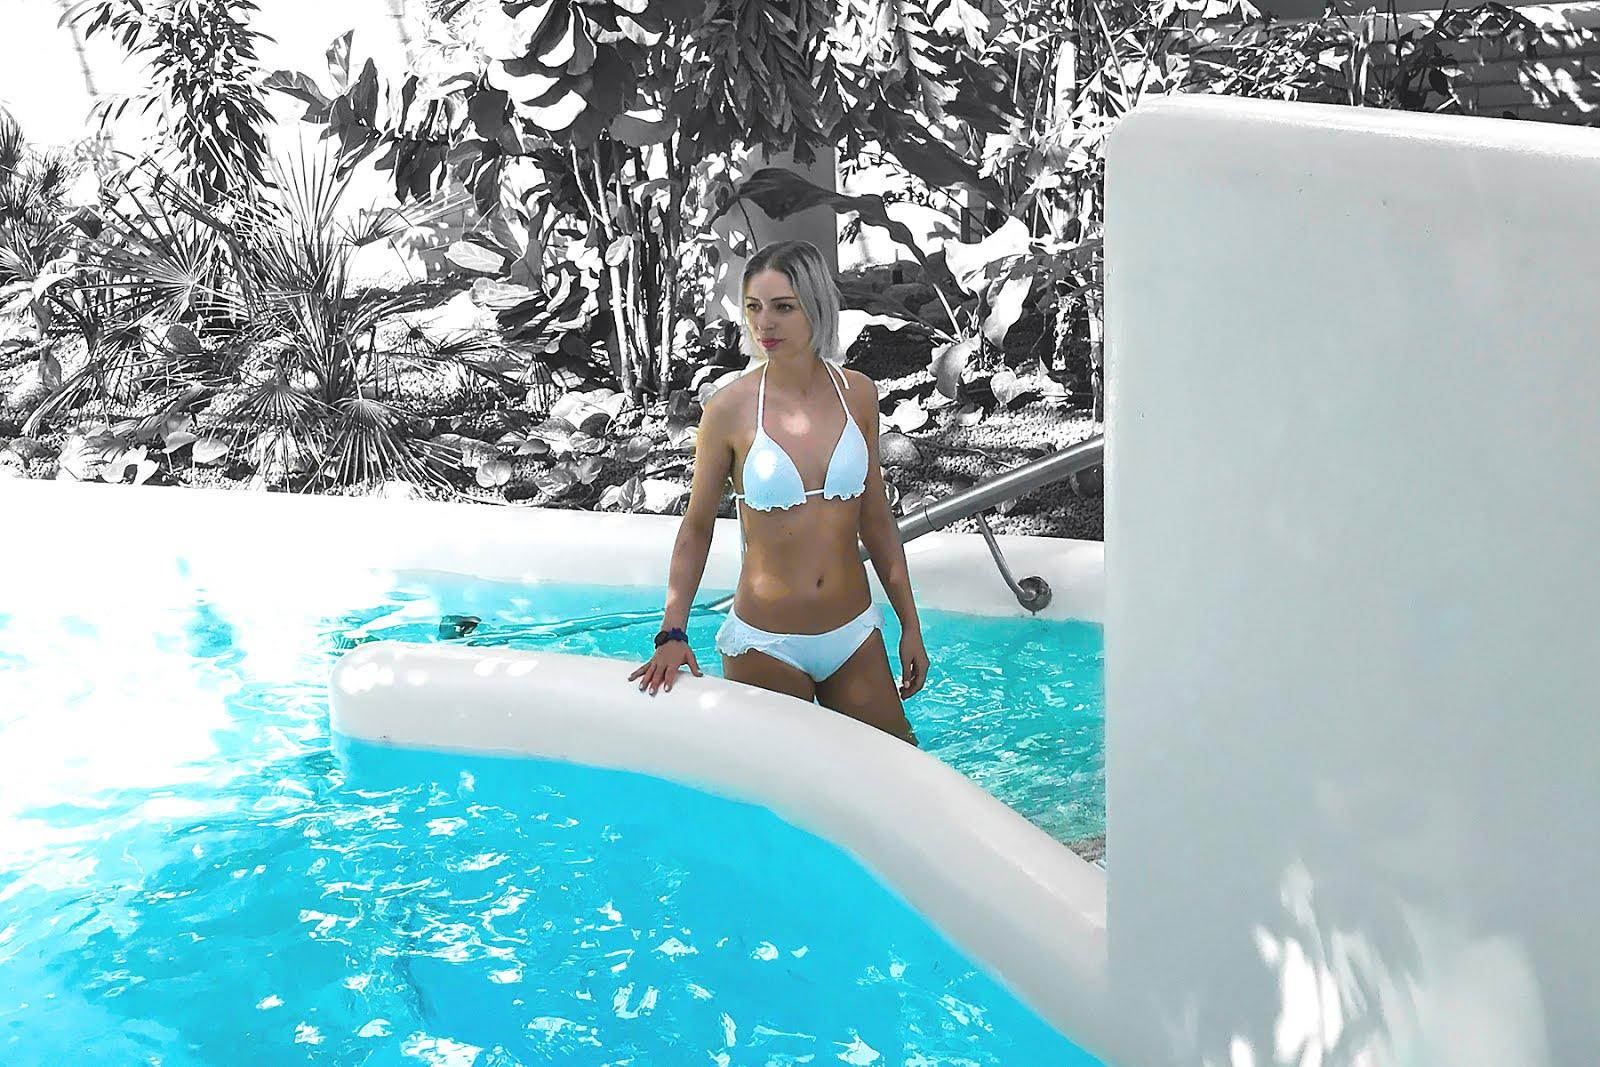 Thermae 2000, gezond en relax kuur, wellness, valkenburg, aquafitness, aquafloating, calzedonia bikini, white